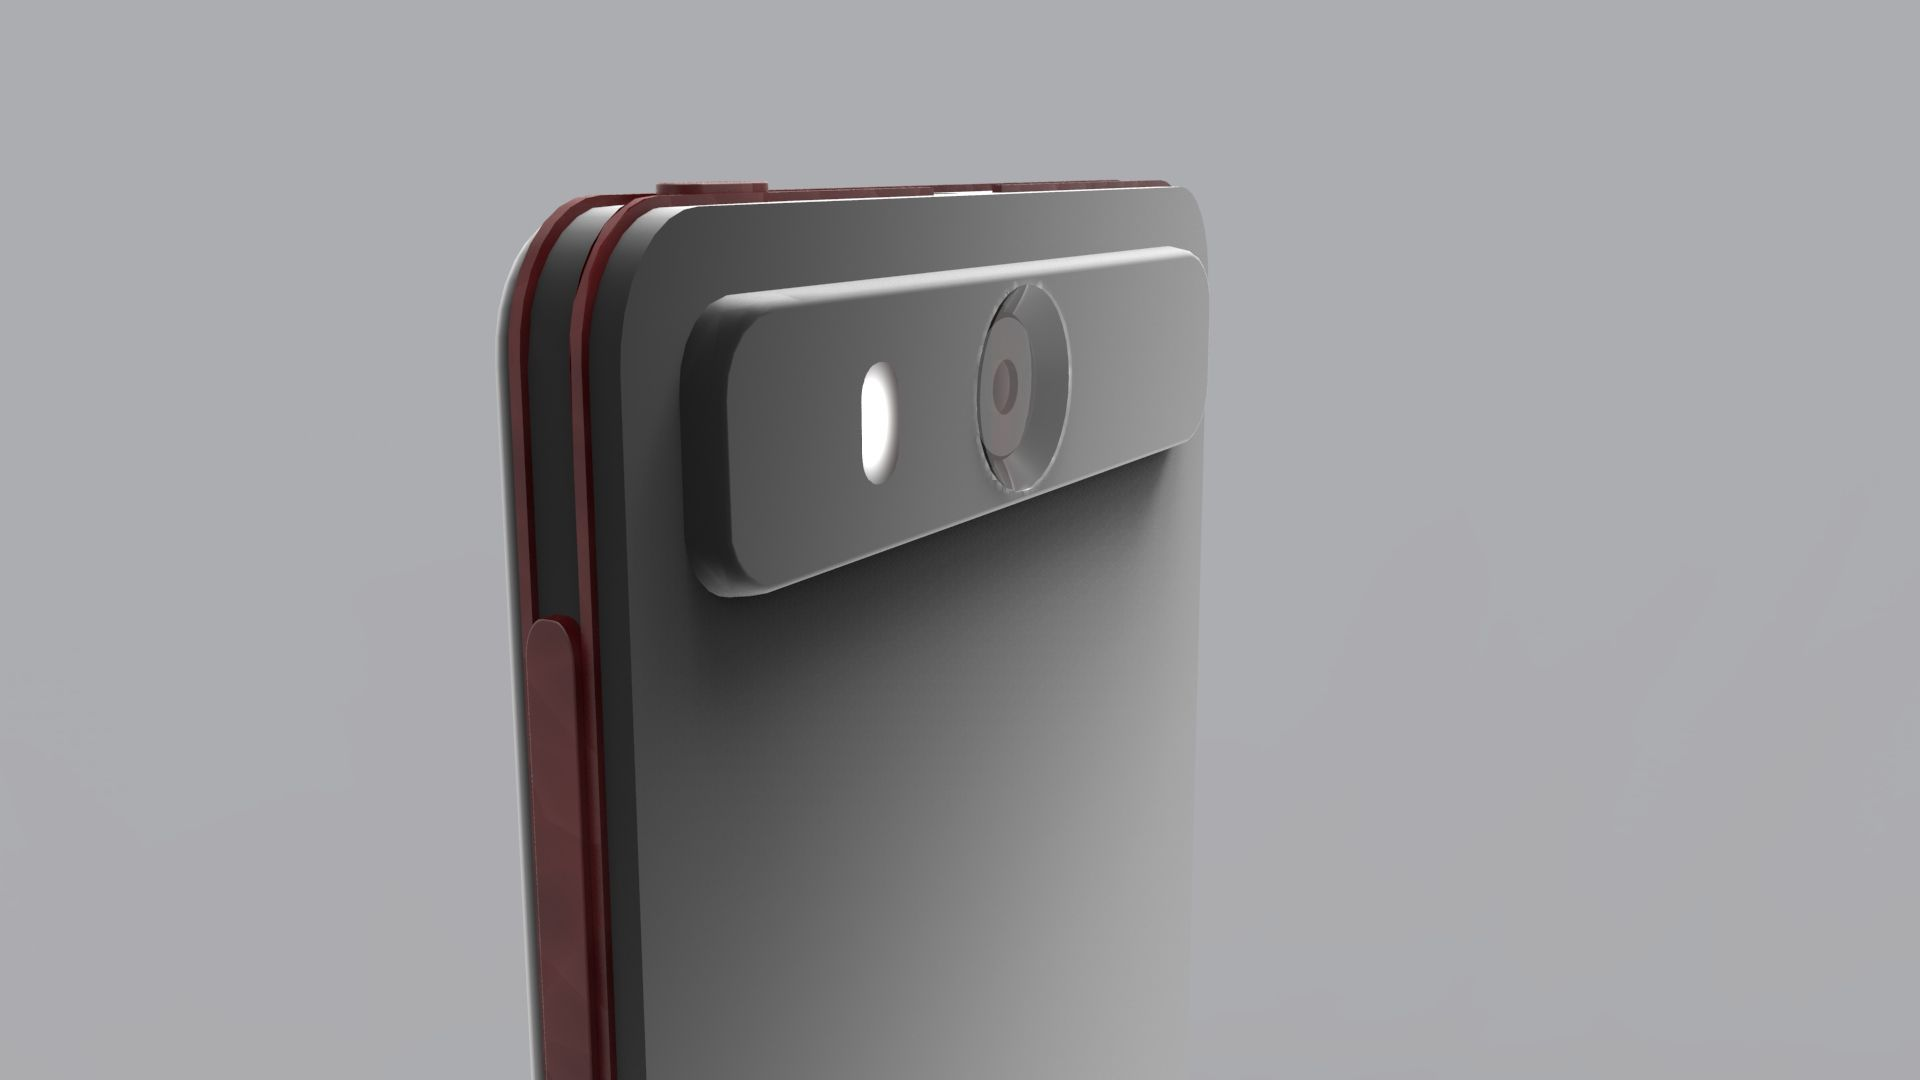 My own Phone Design|Autodesk Online Gallery